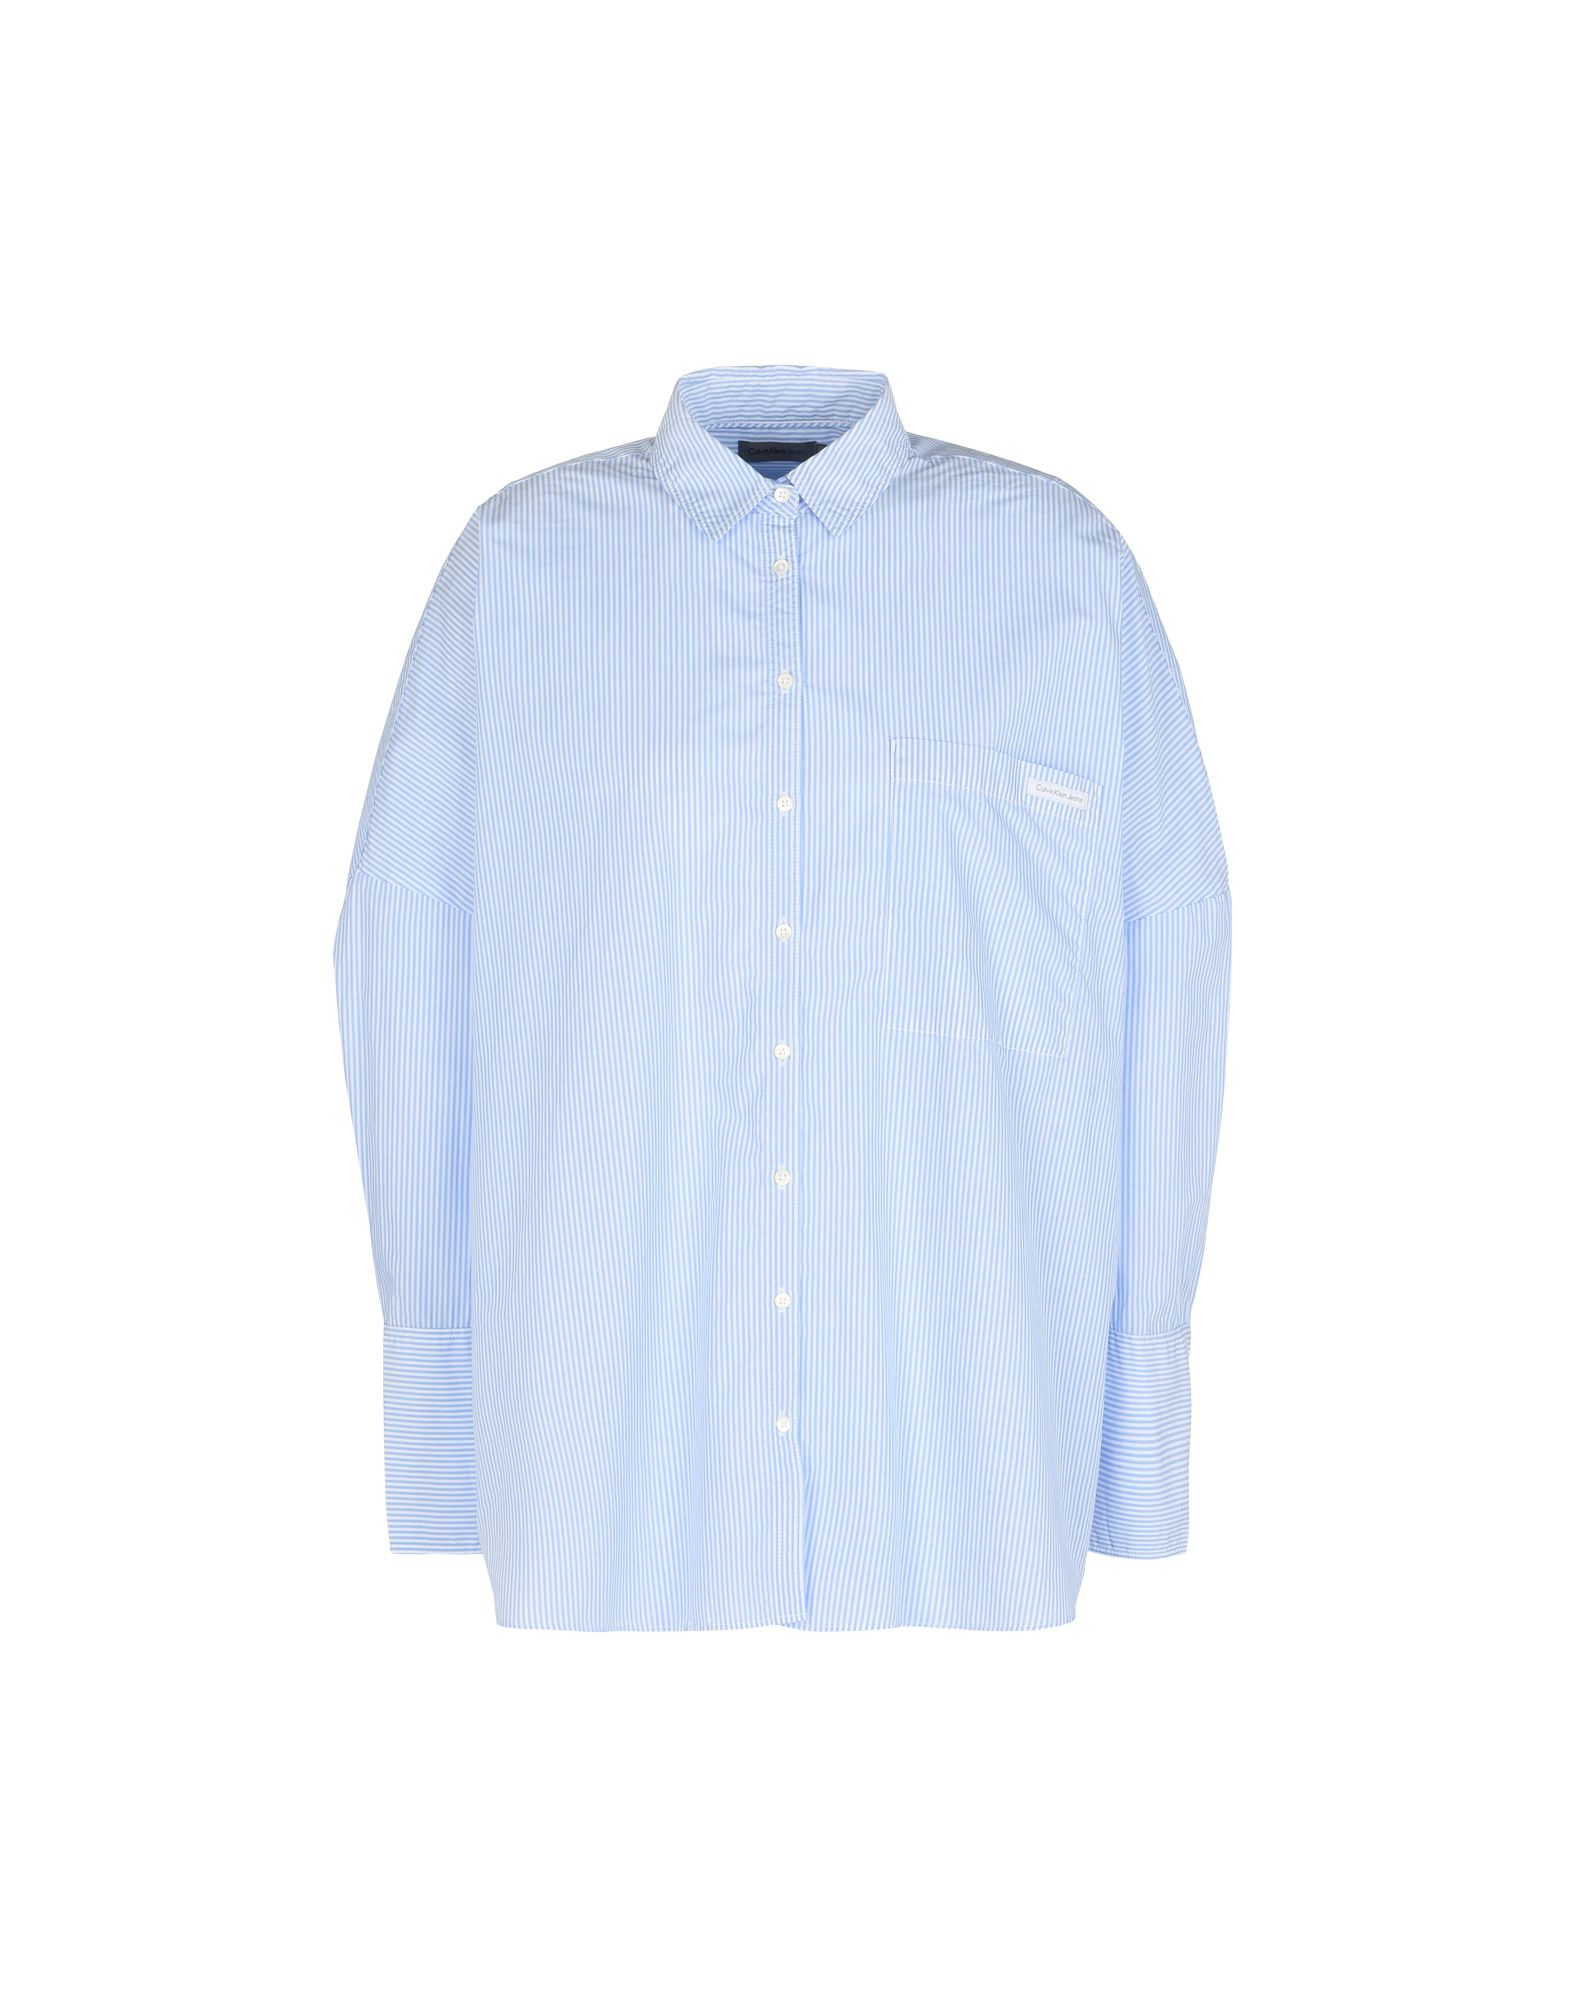 CALVIN KLEIN JEANS Pубашка calvin klein jeans pубашка